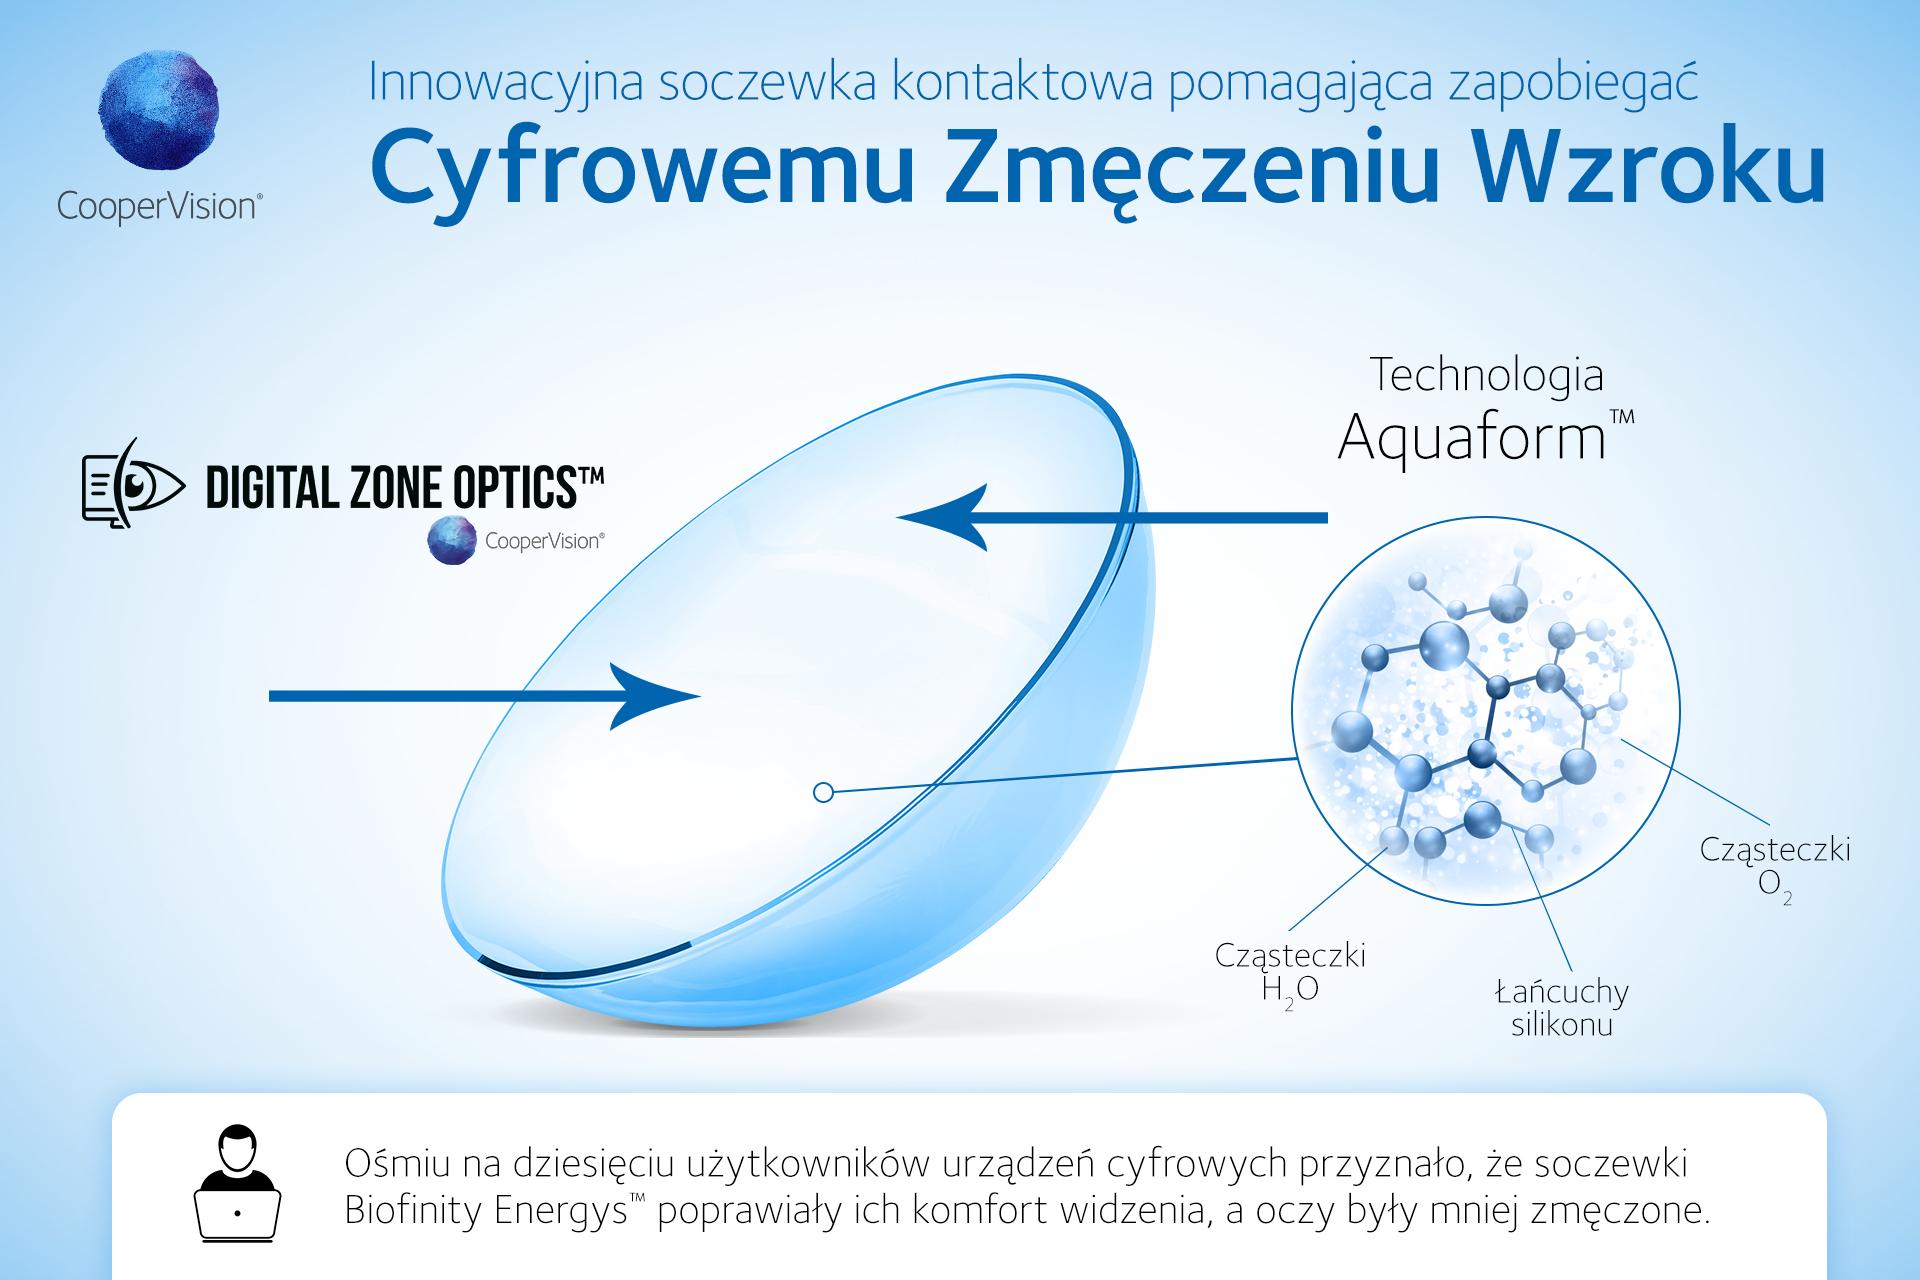 Konstrukcja Digital Zone Optics™